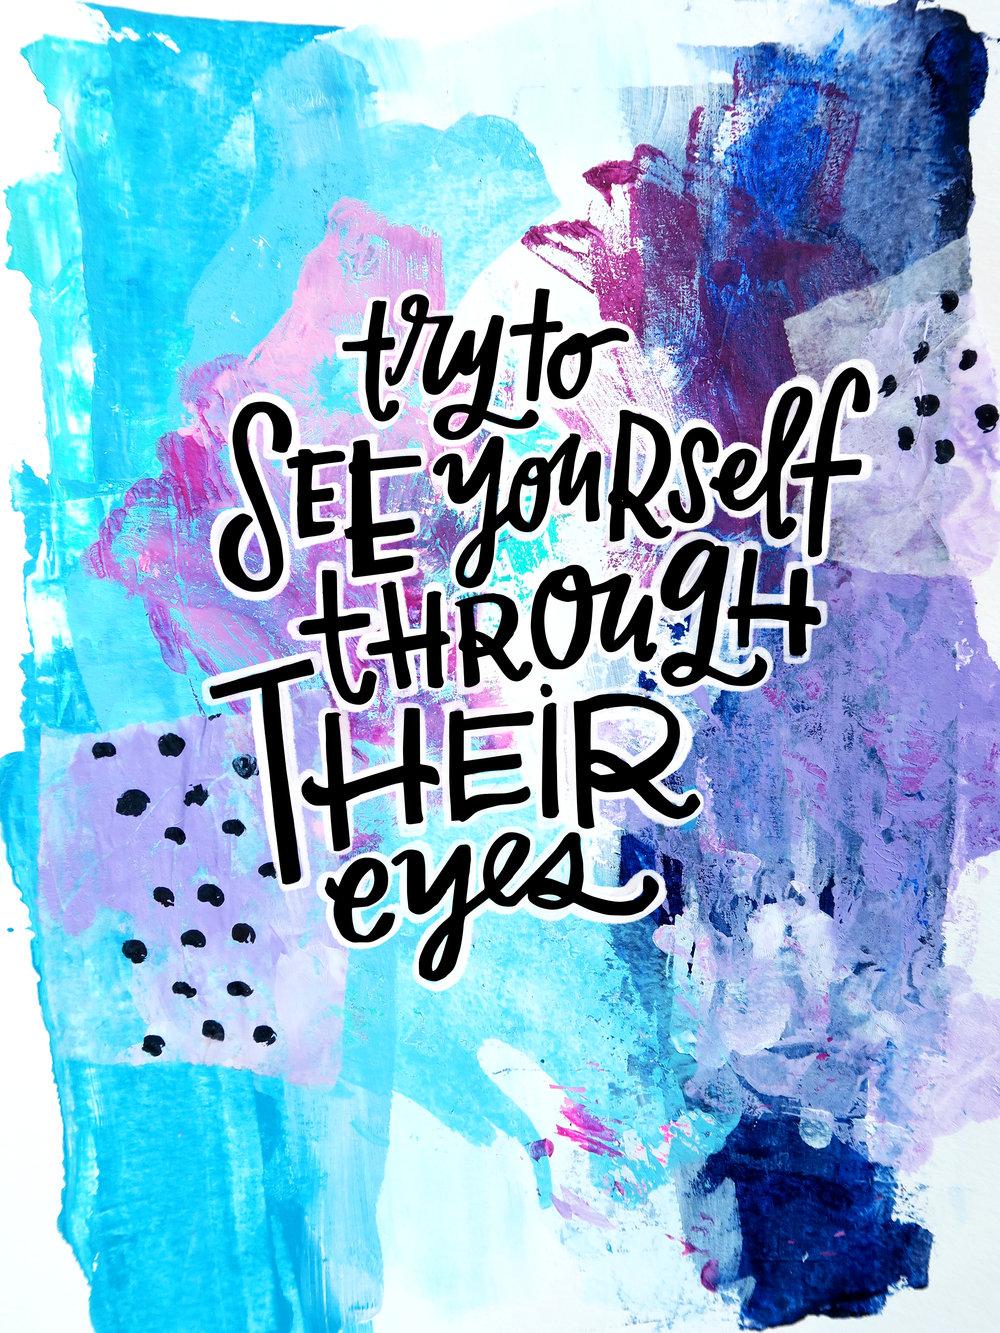 7/12/16: Eyes